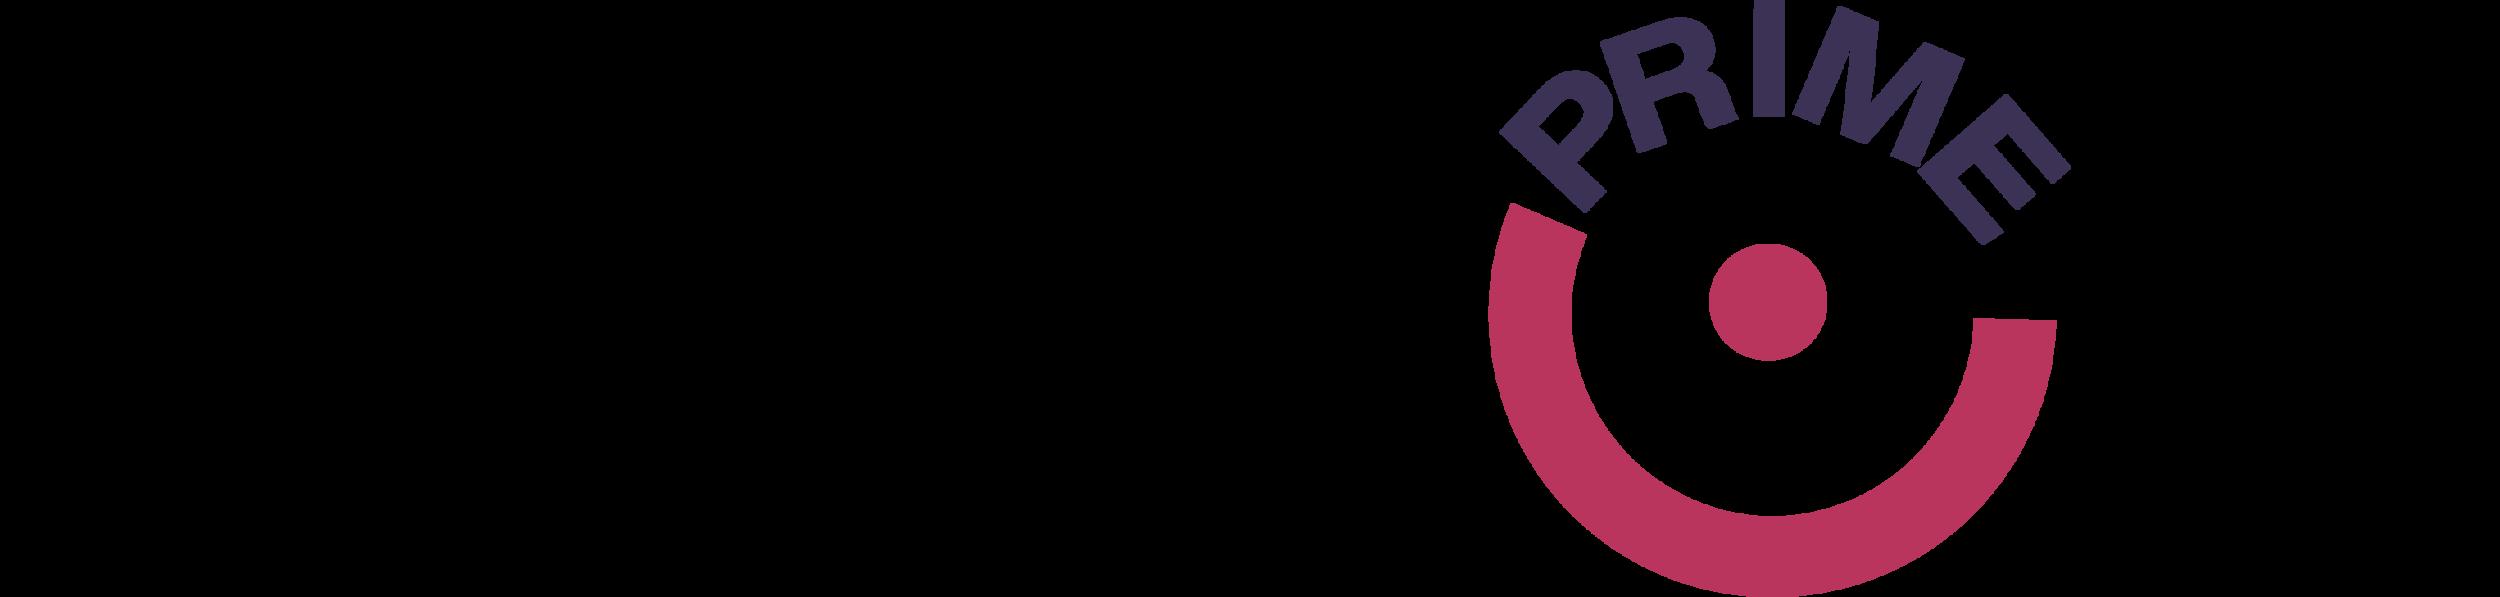 discop prime logo.png